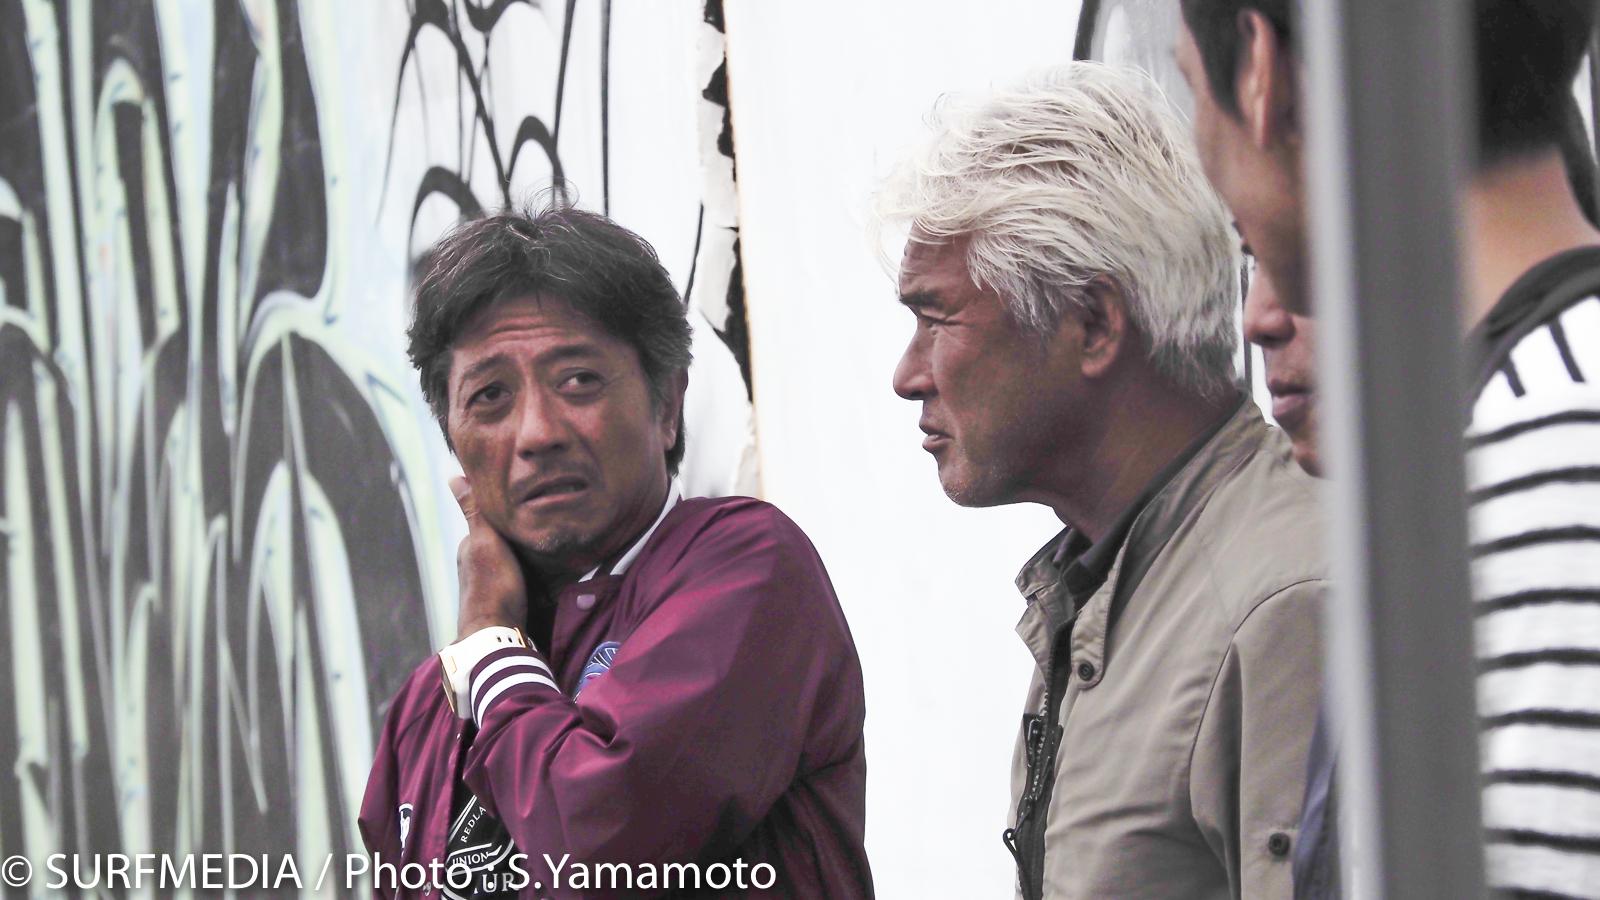 norihiko okano hiromichi soeda-9020131